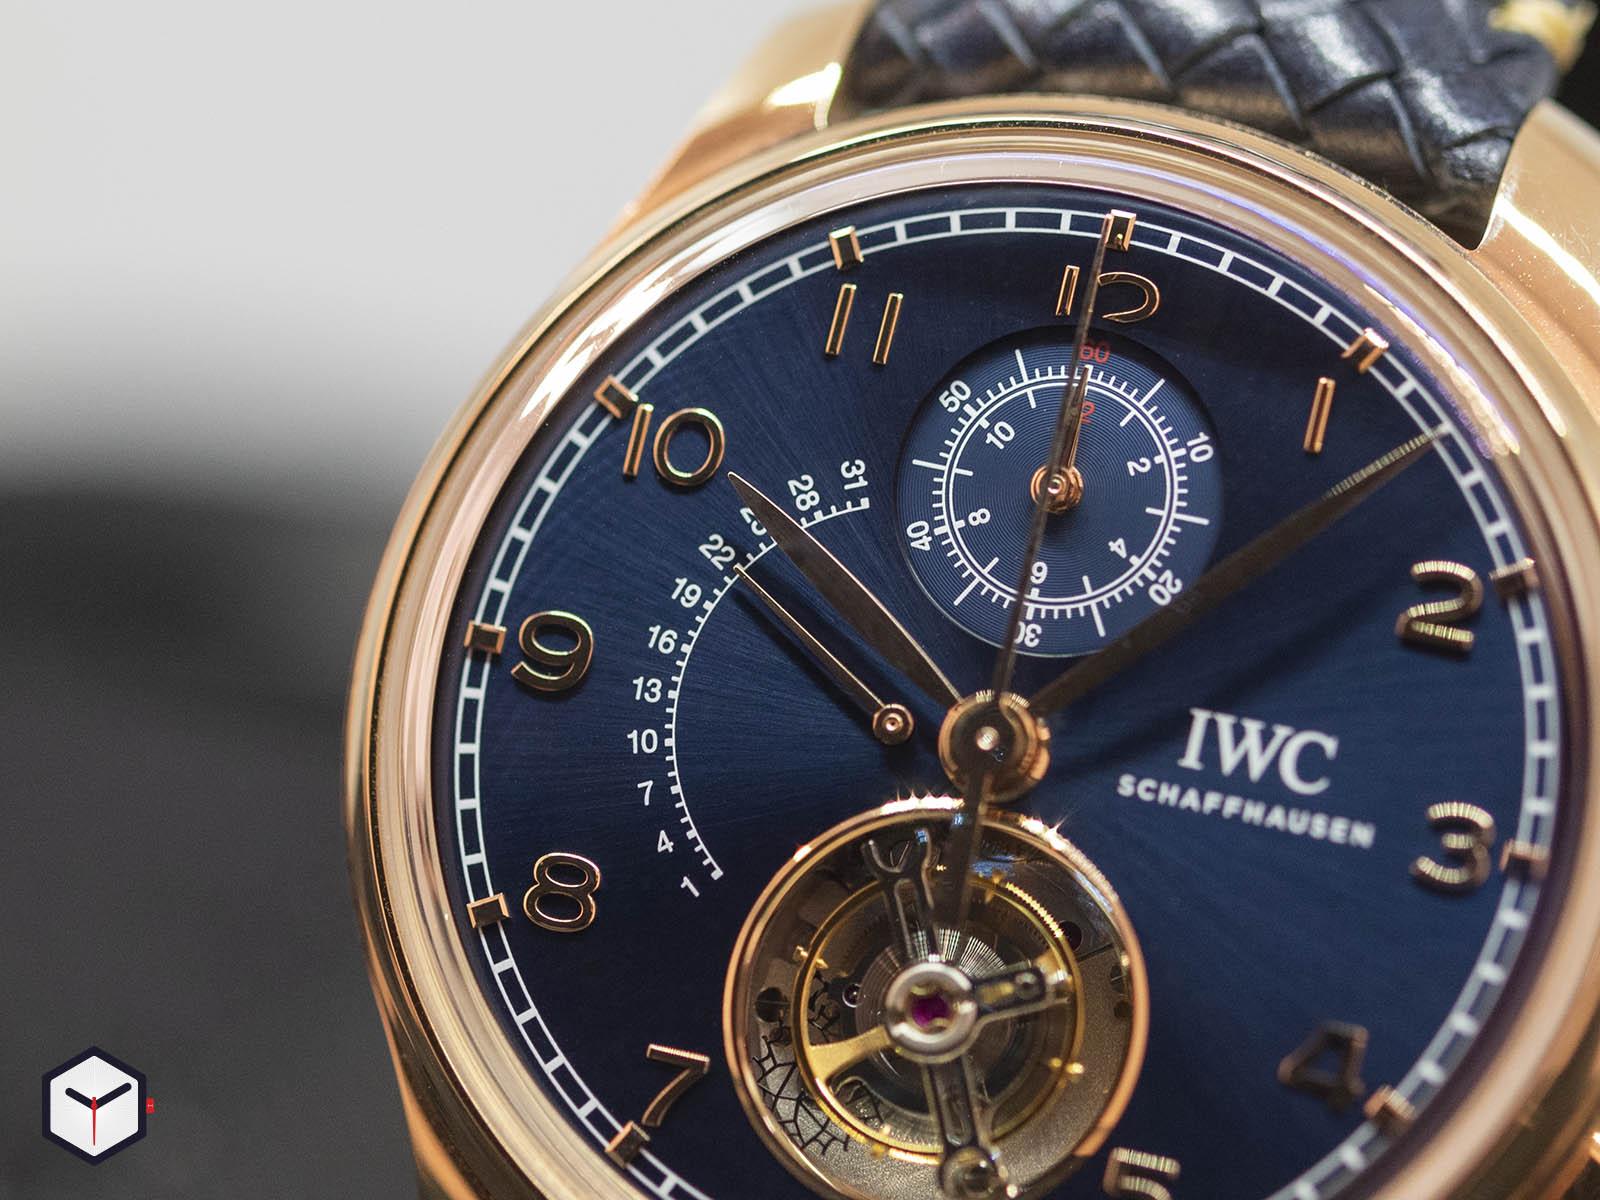 iw394005-iwc-portugieser-tourbillon-retrograde-chronograph-boutique-edition-3.jpg